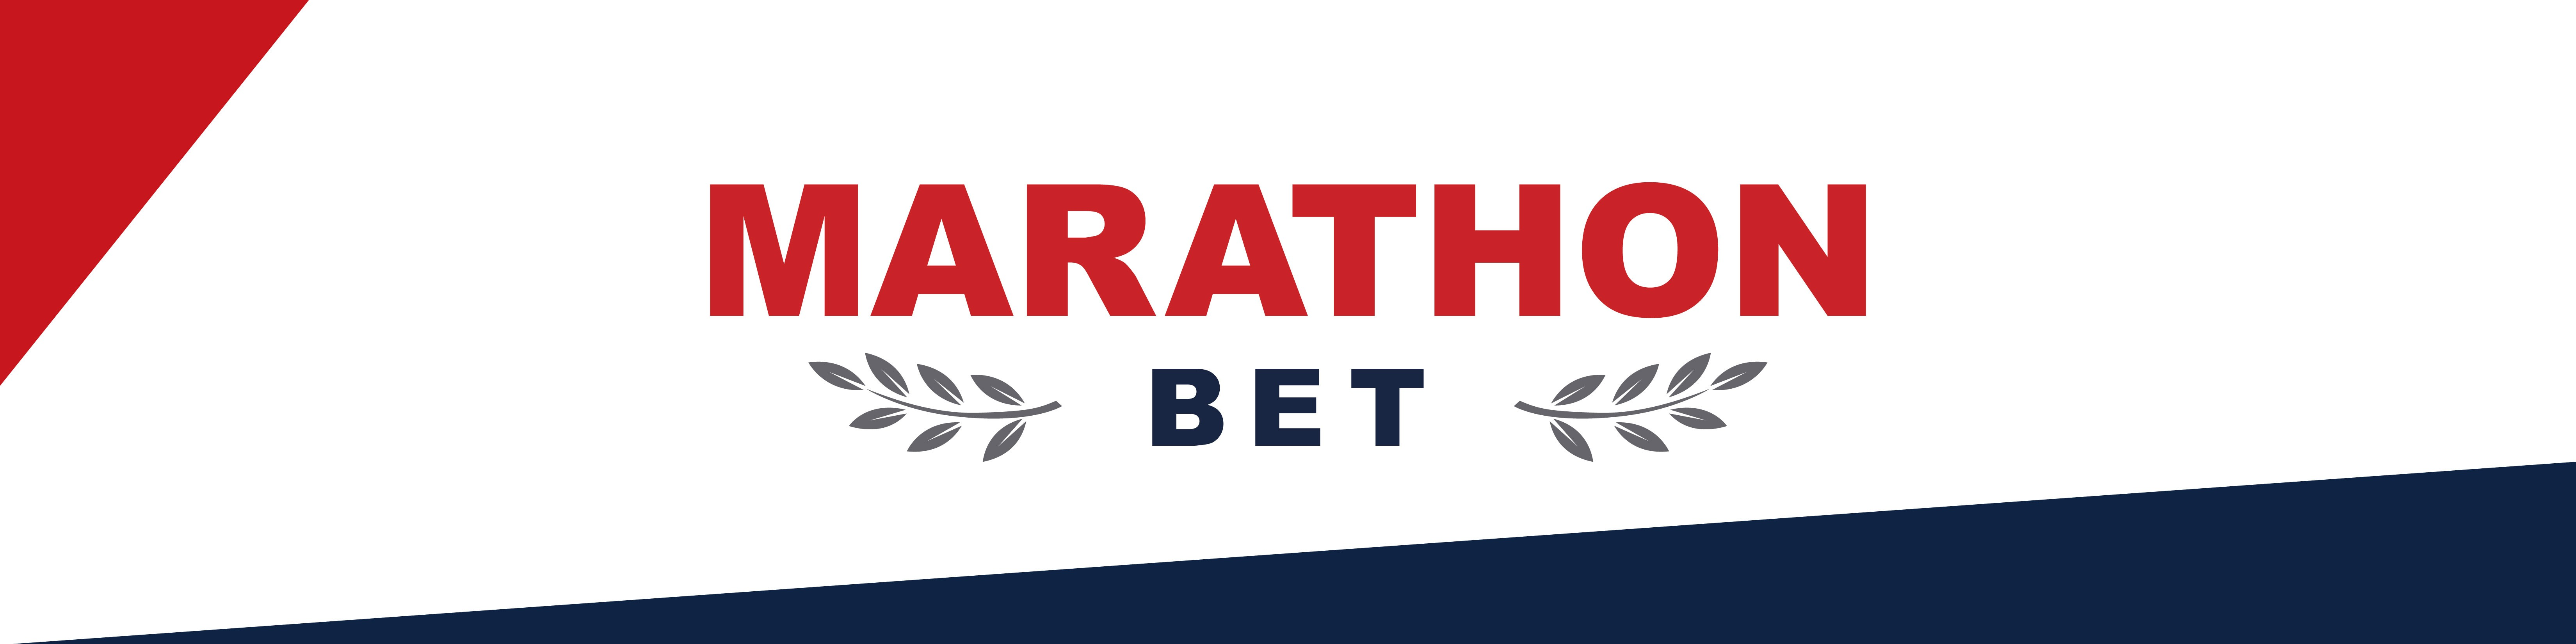 marathonbet betting